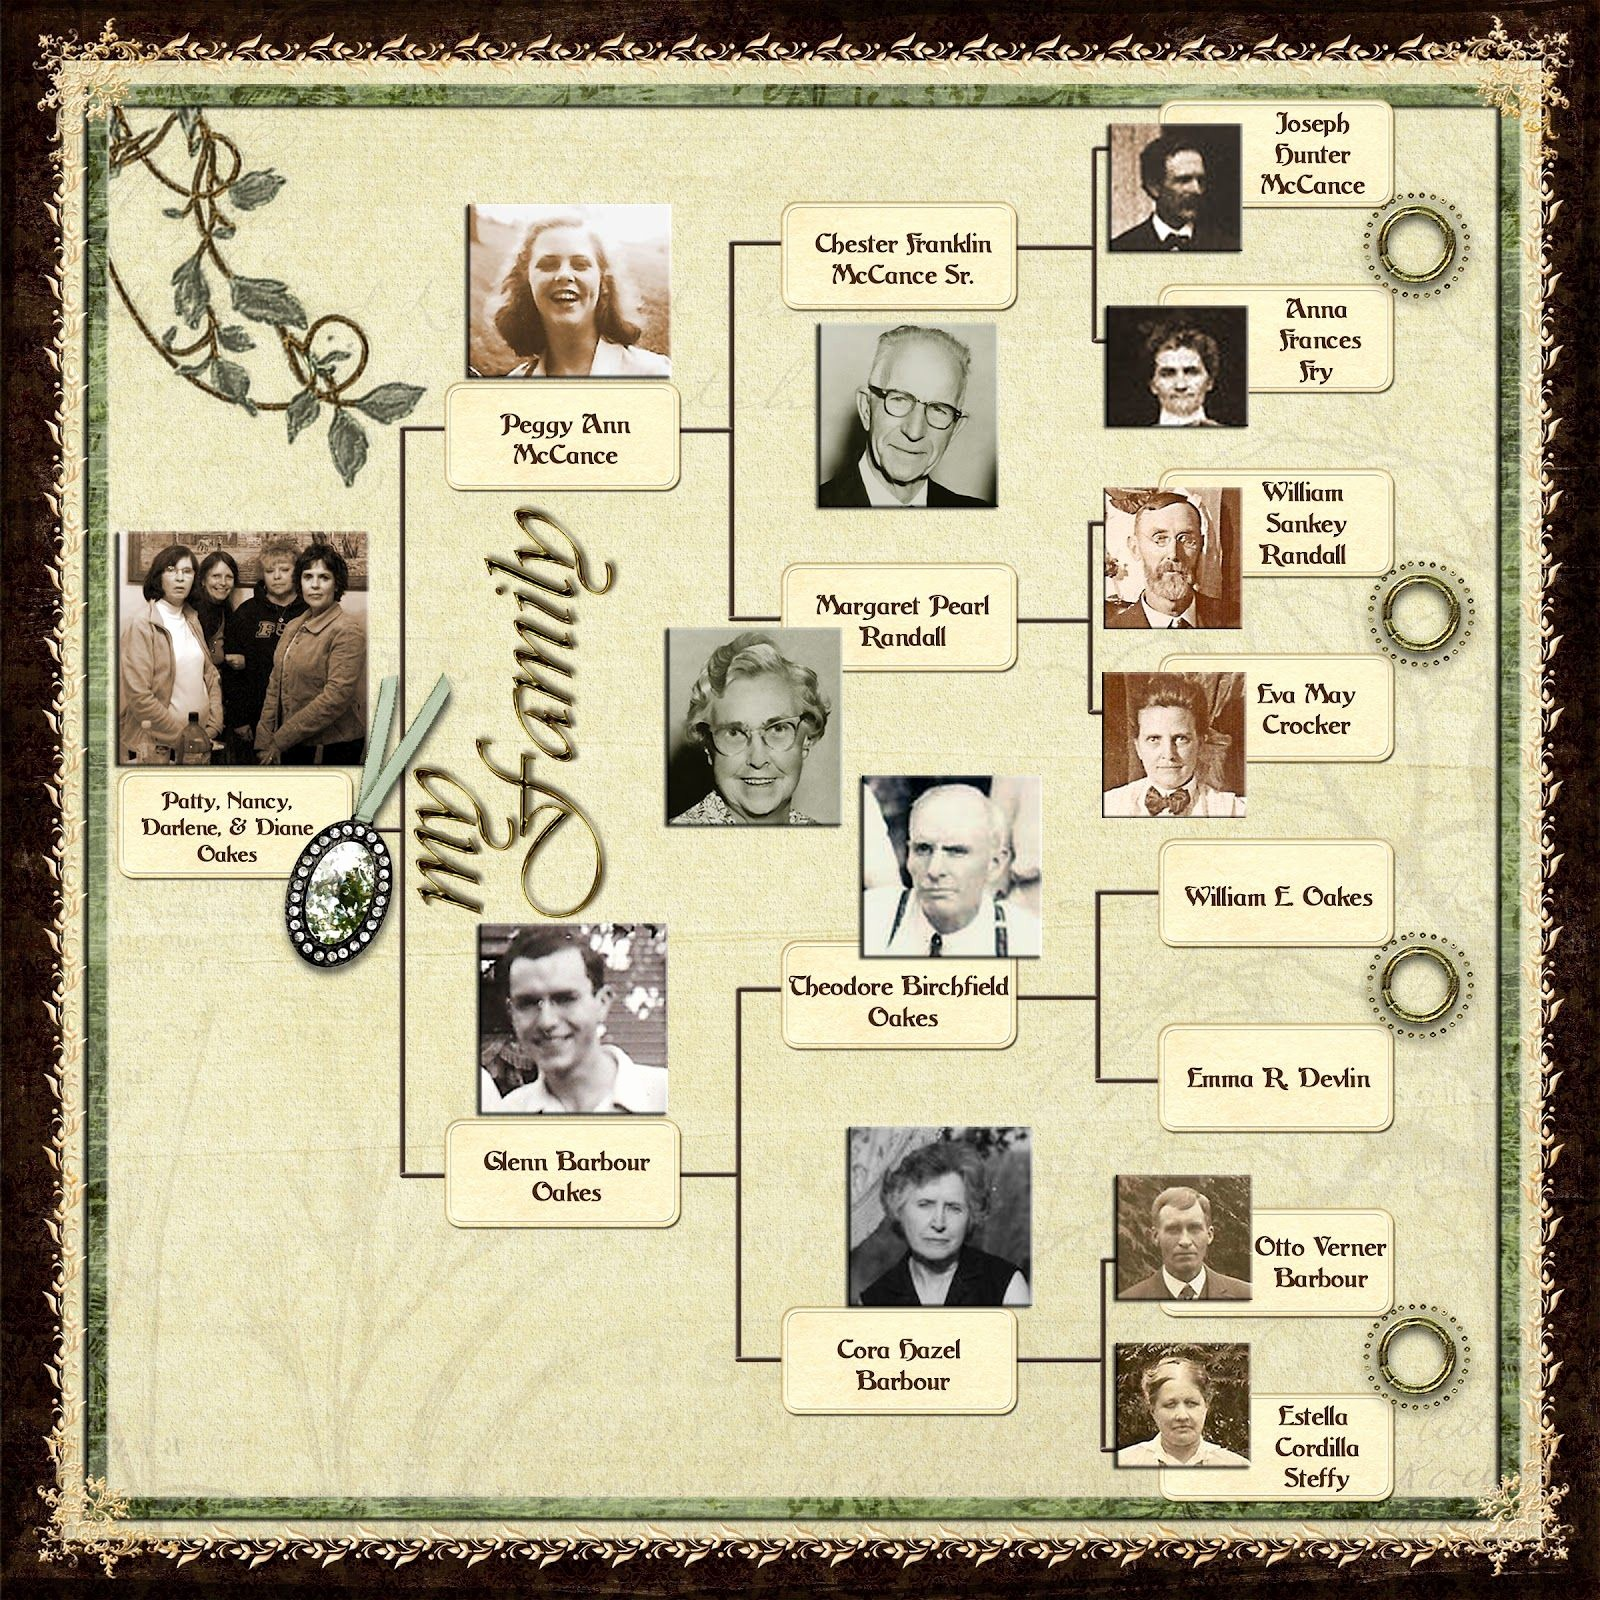 Family History Book Layout Ideas Lovely Family History Scrapbook Layouts